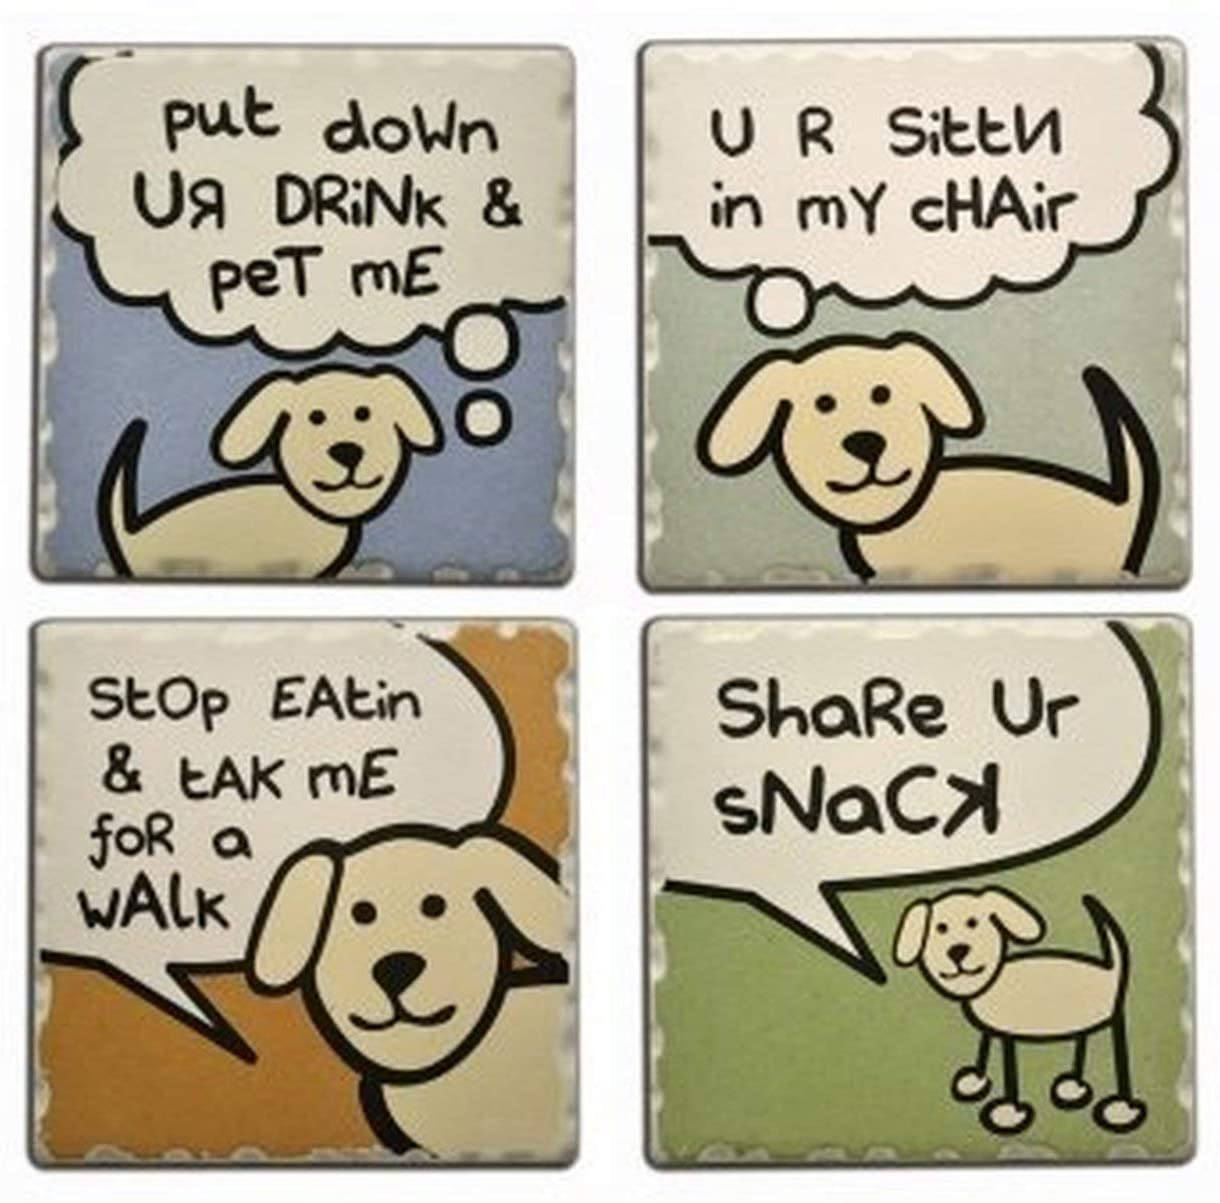 Dog Speak - Four Absorbent Stone Coasters - Funny Illustrated Dog Coasters